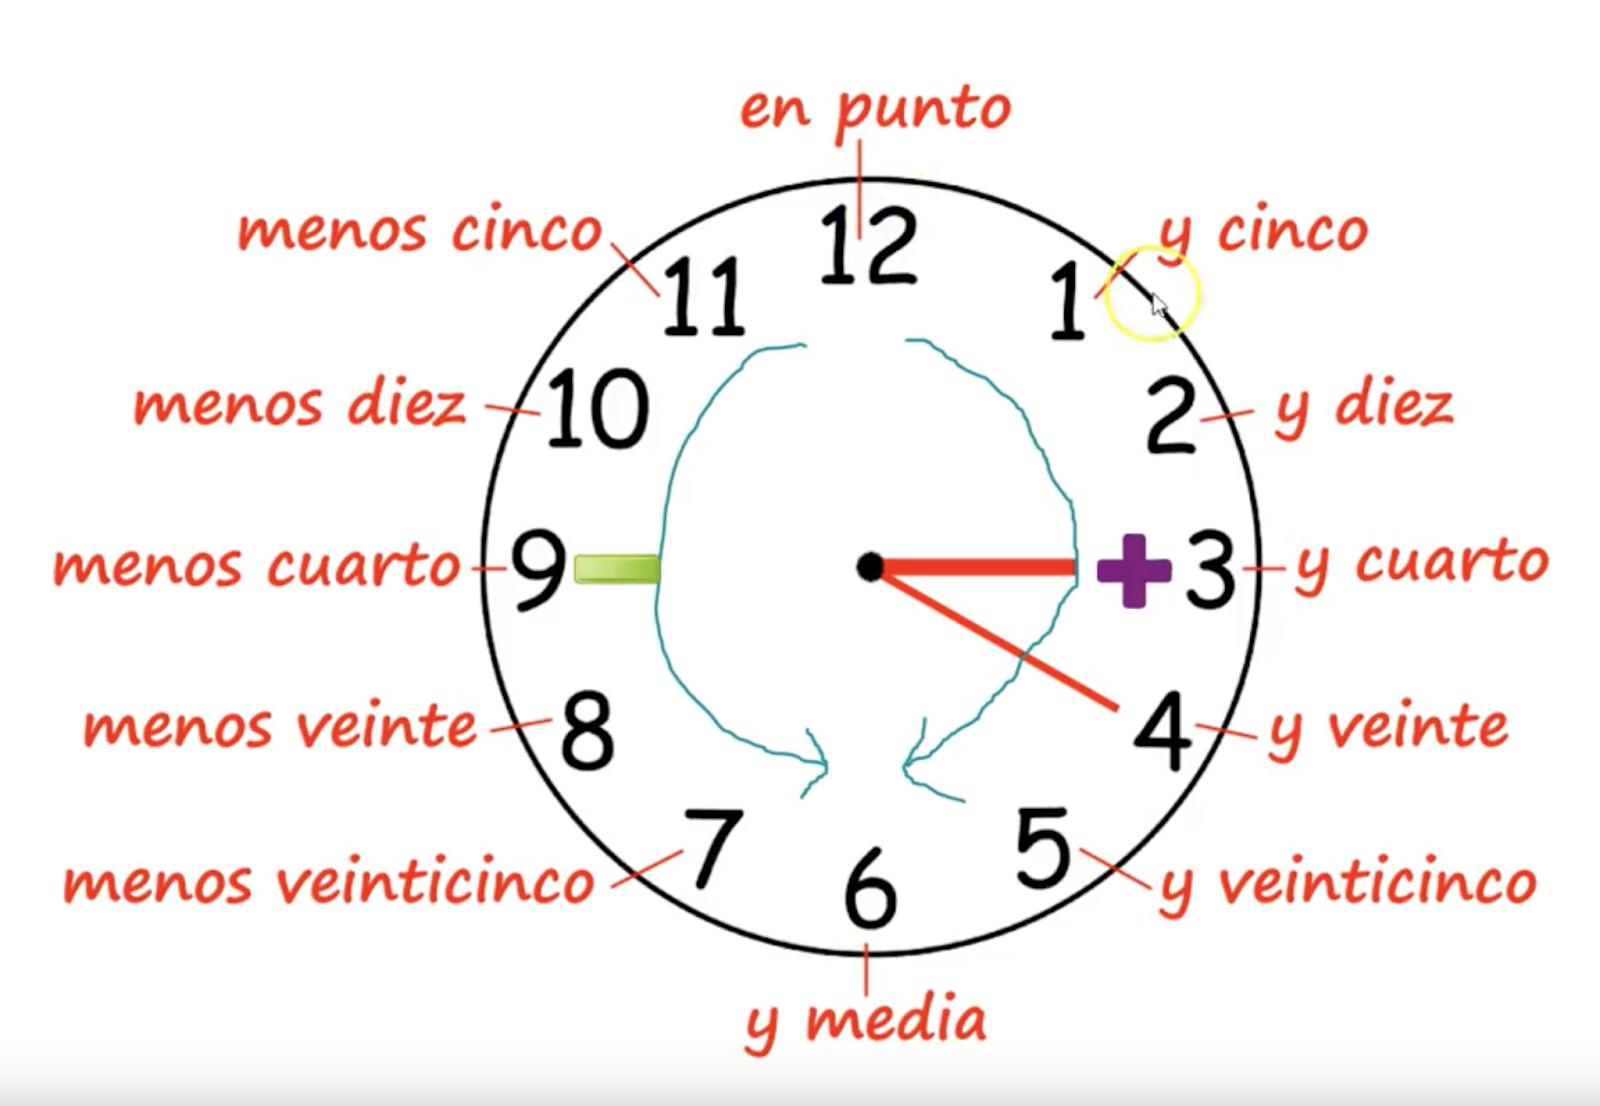 Basic Spanish For Youth Diversion Program Staff